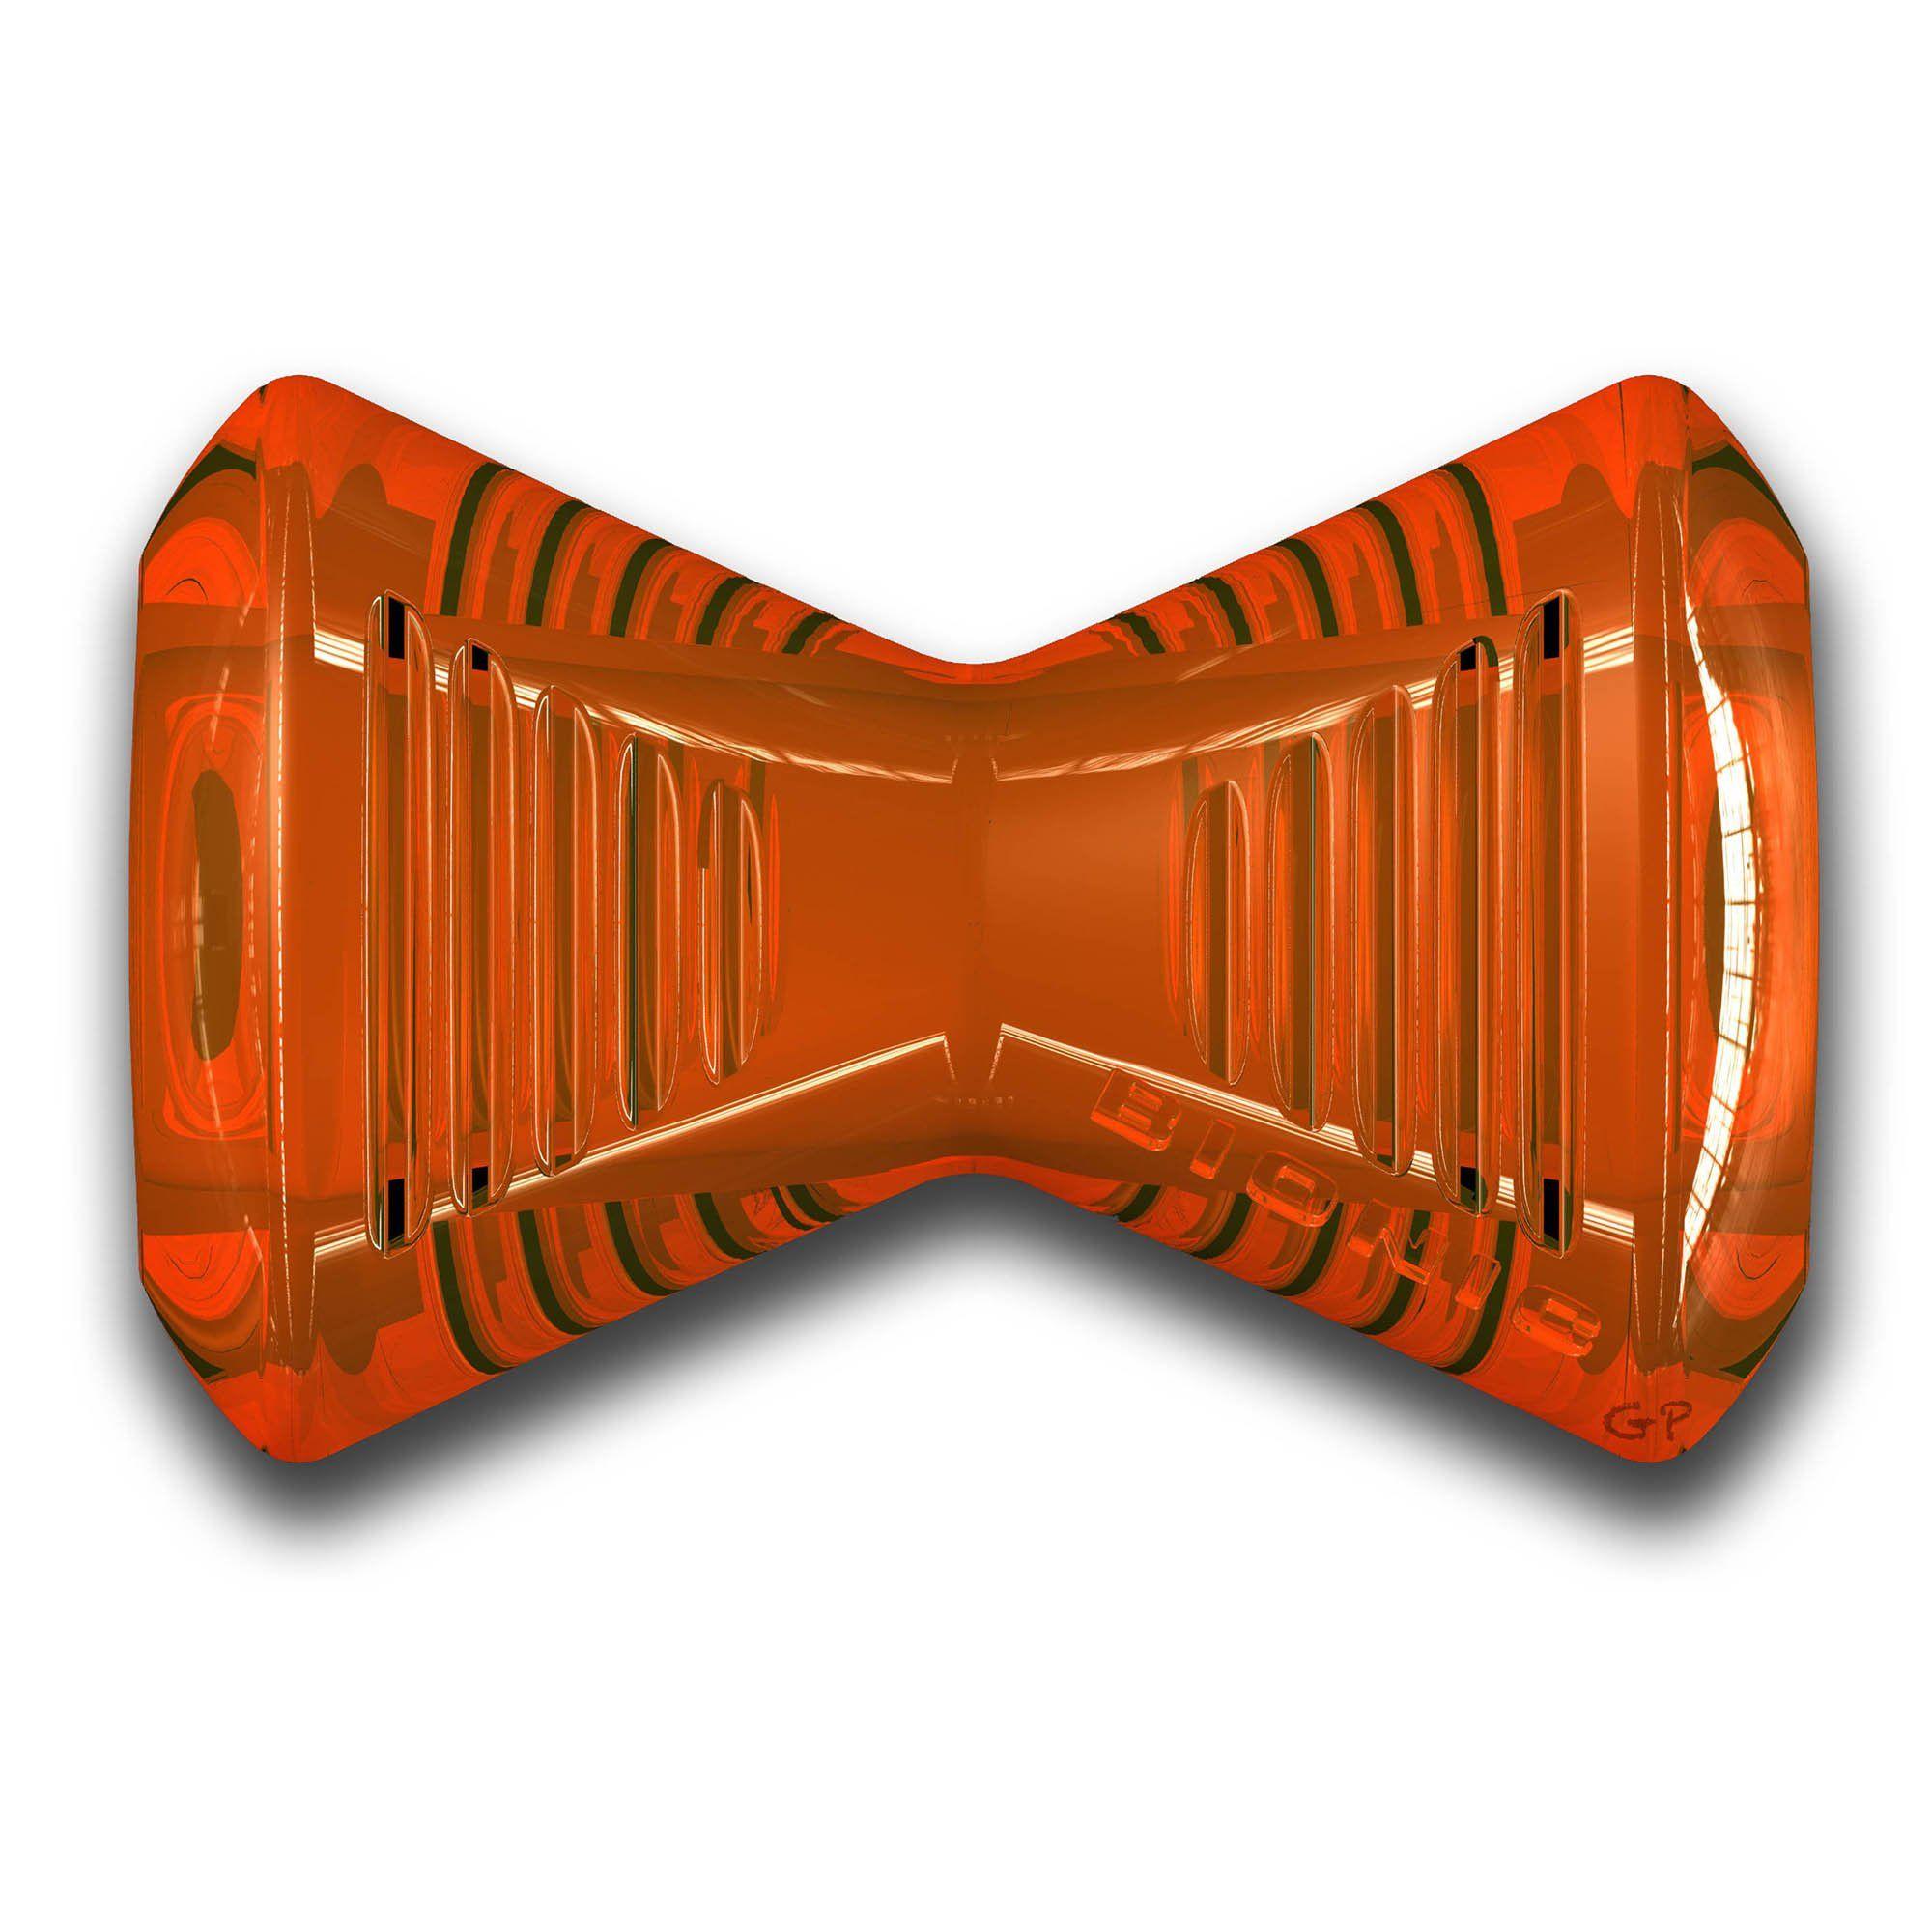 Outward Hound Bionic Bone In Orange Petco Noel Gift Ideas For